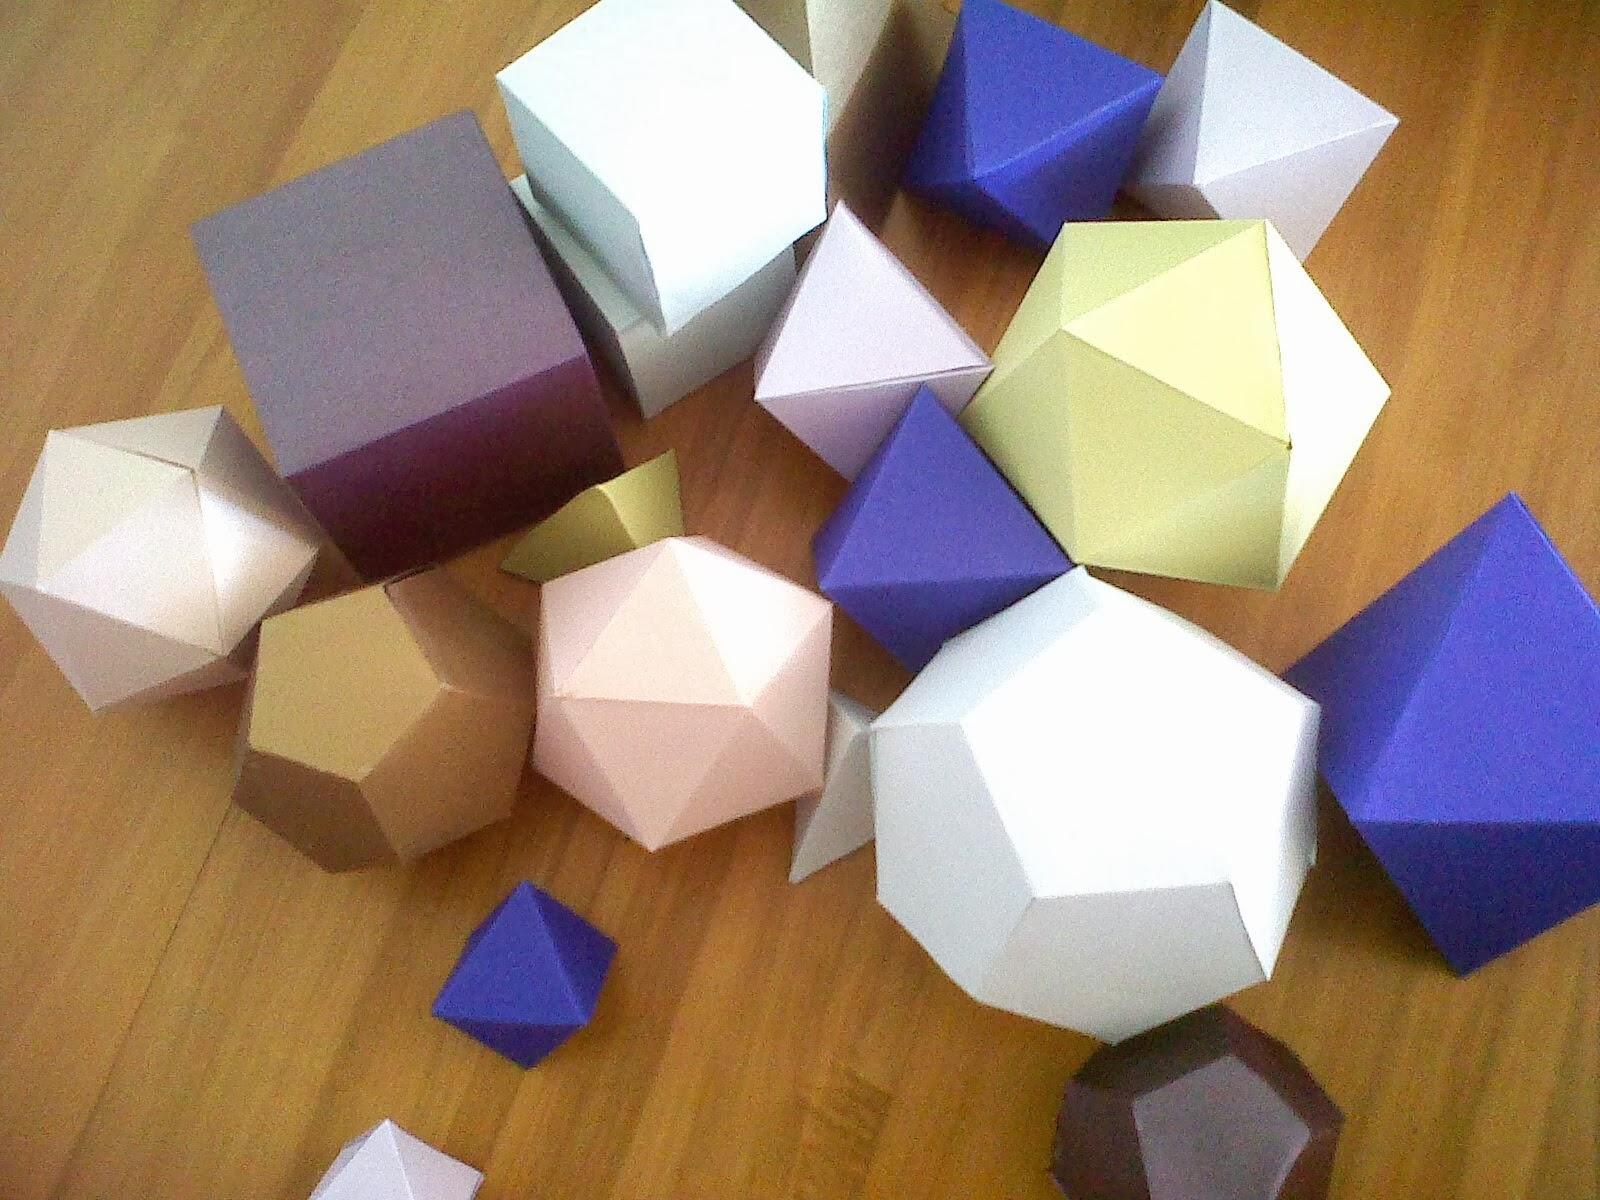 DIY geometric shapes